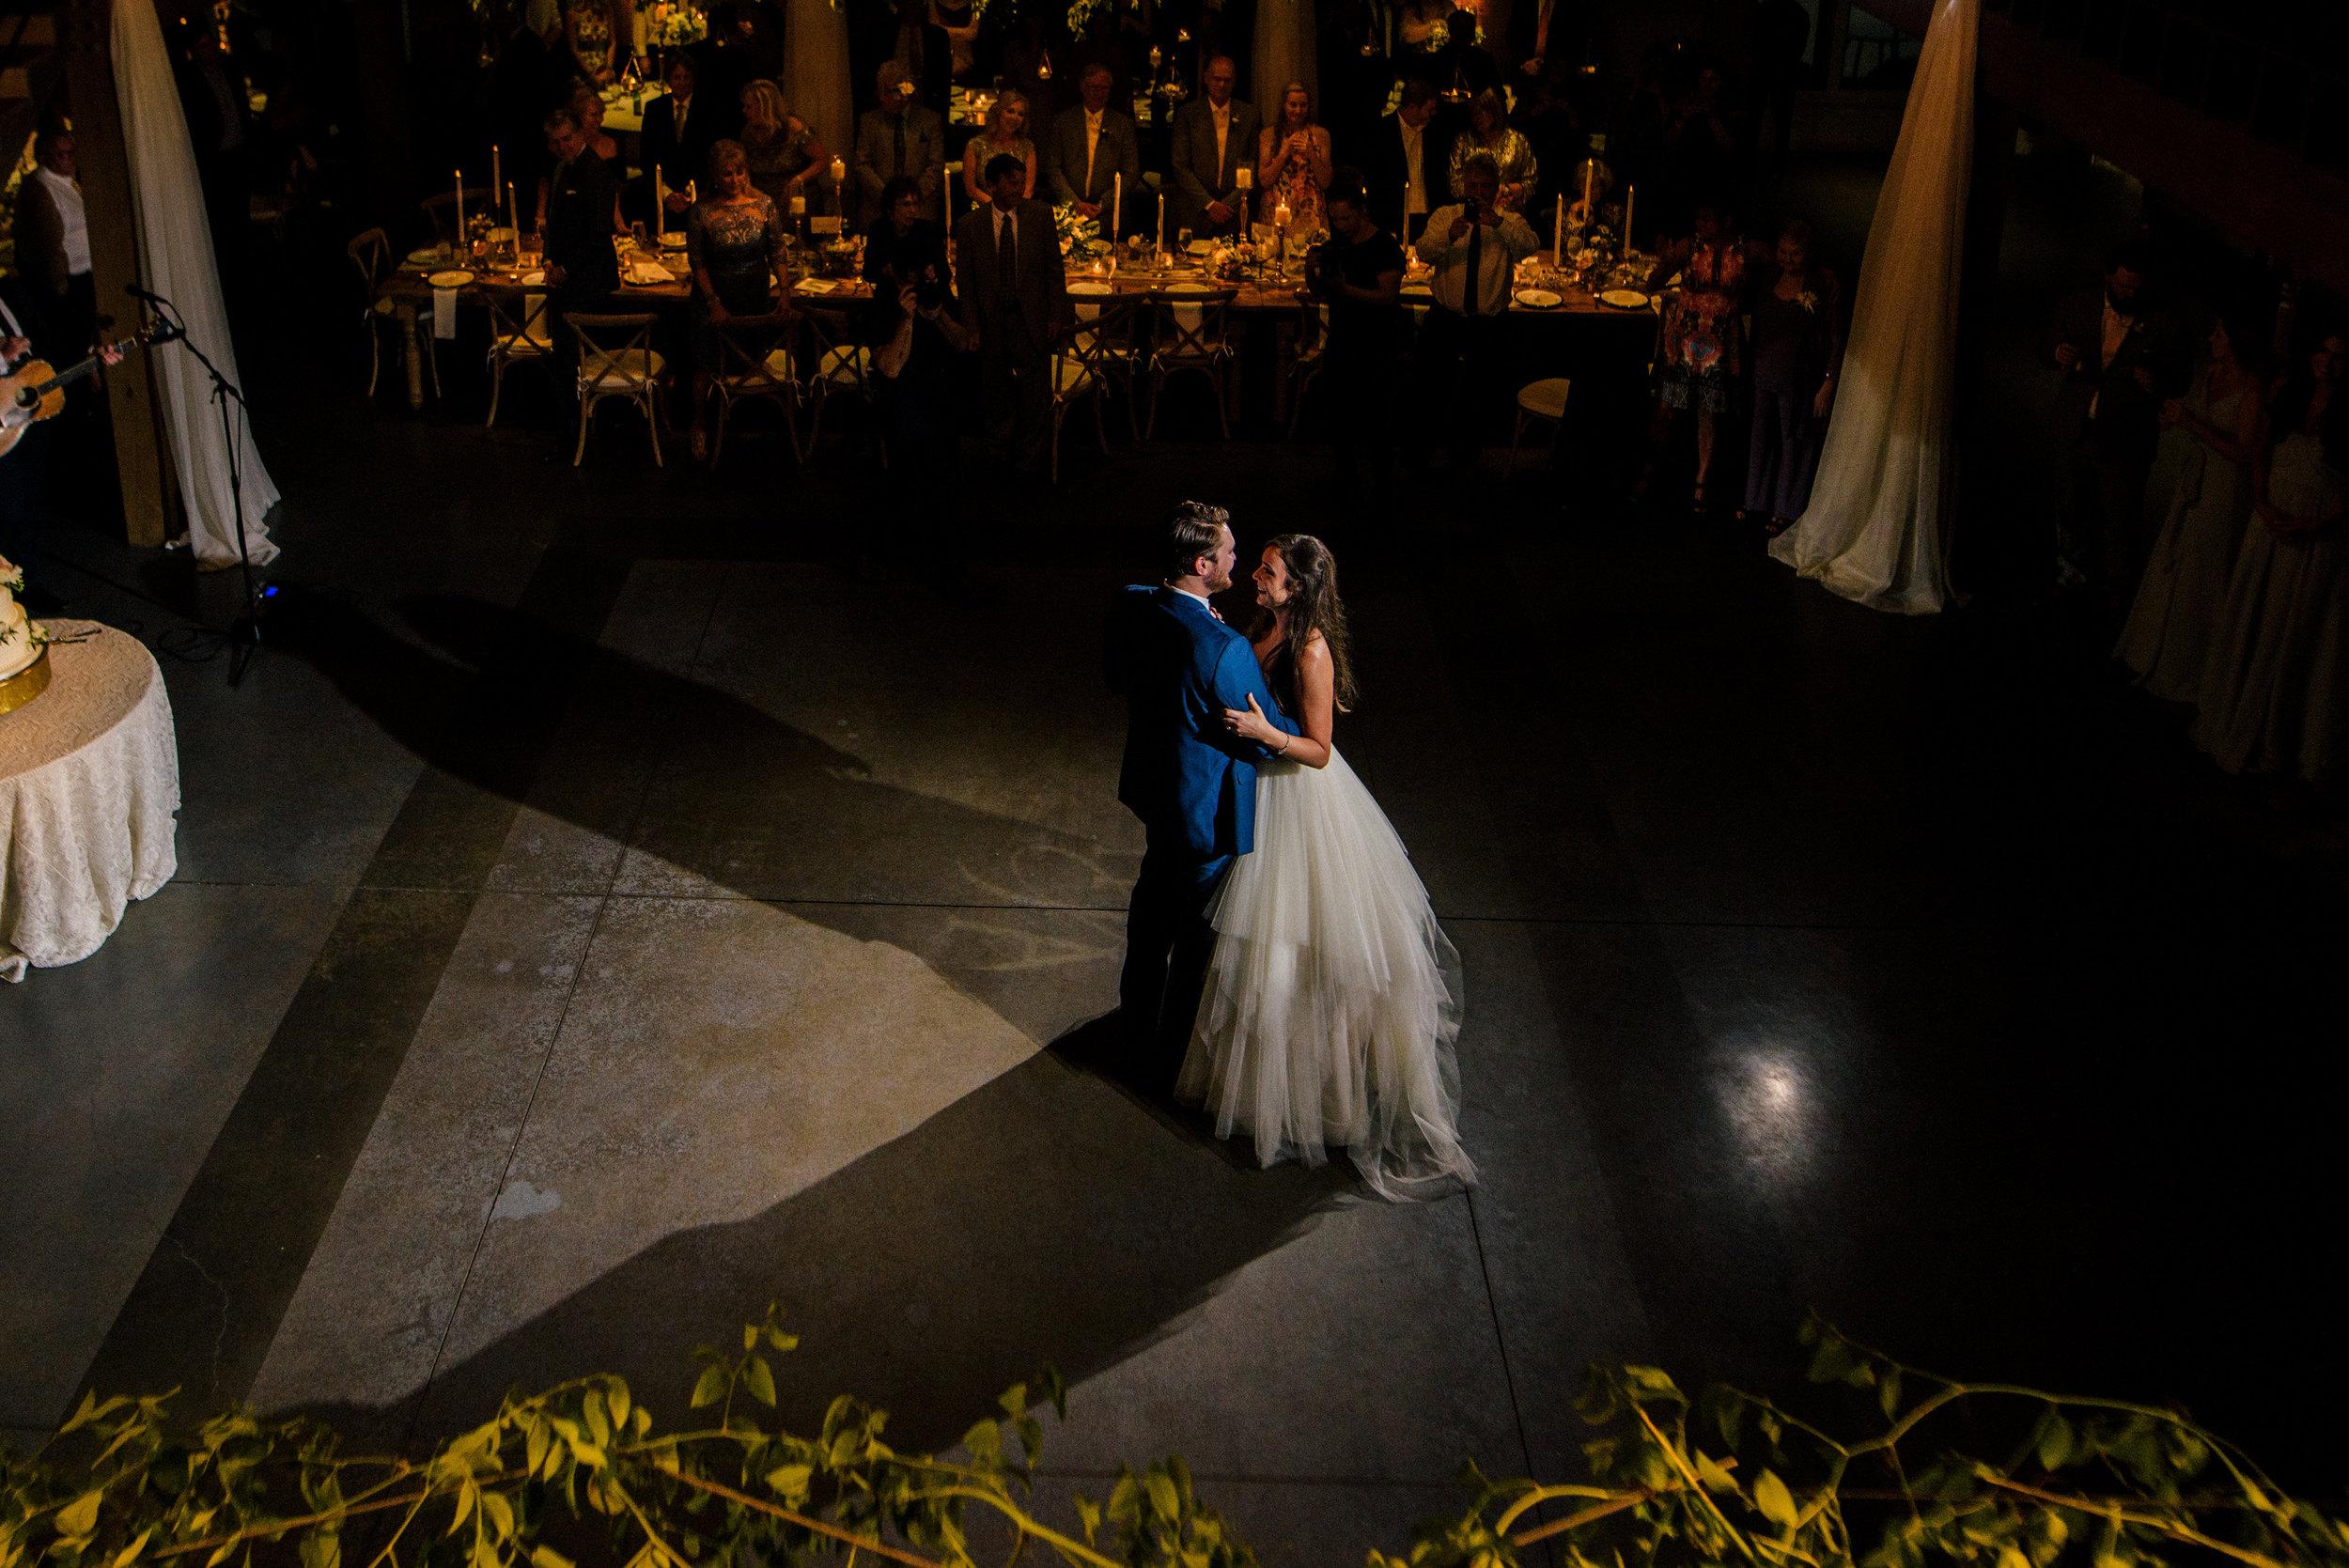 Nashville_Wedding_Photography_Mint_Springs_68.jpg